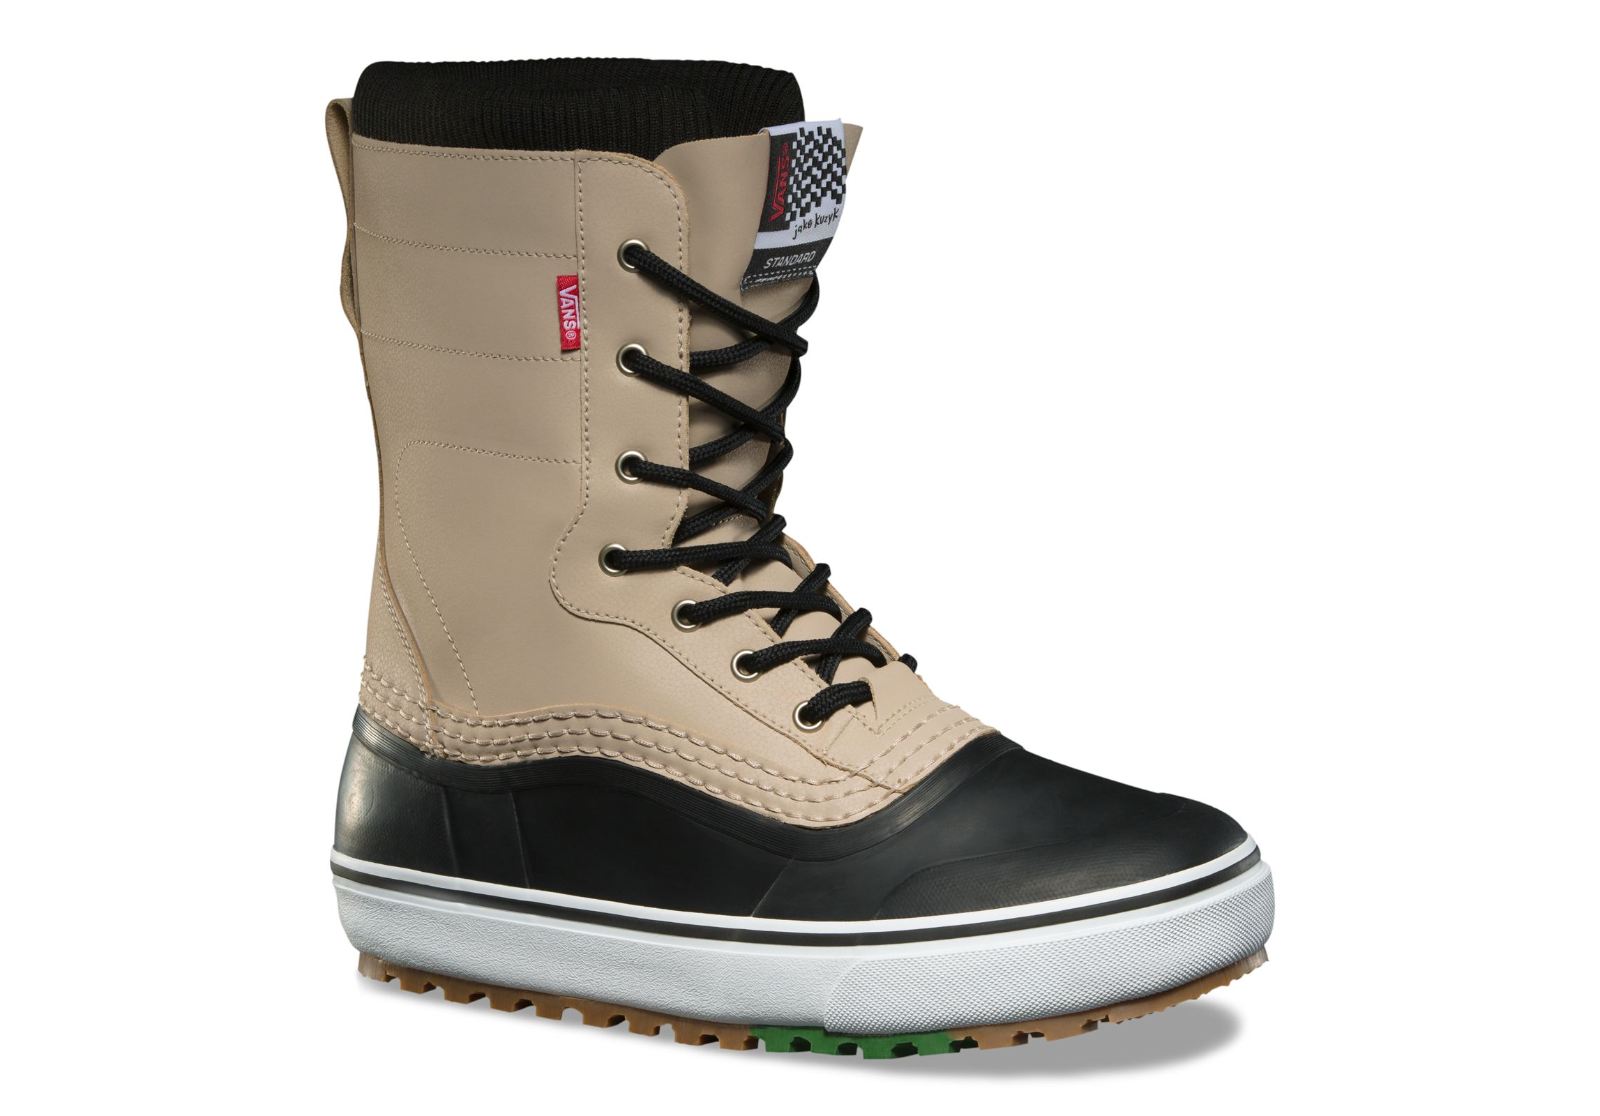 Vans Standard MTE Snow Boot